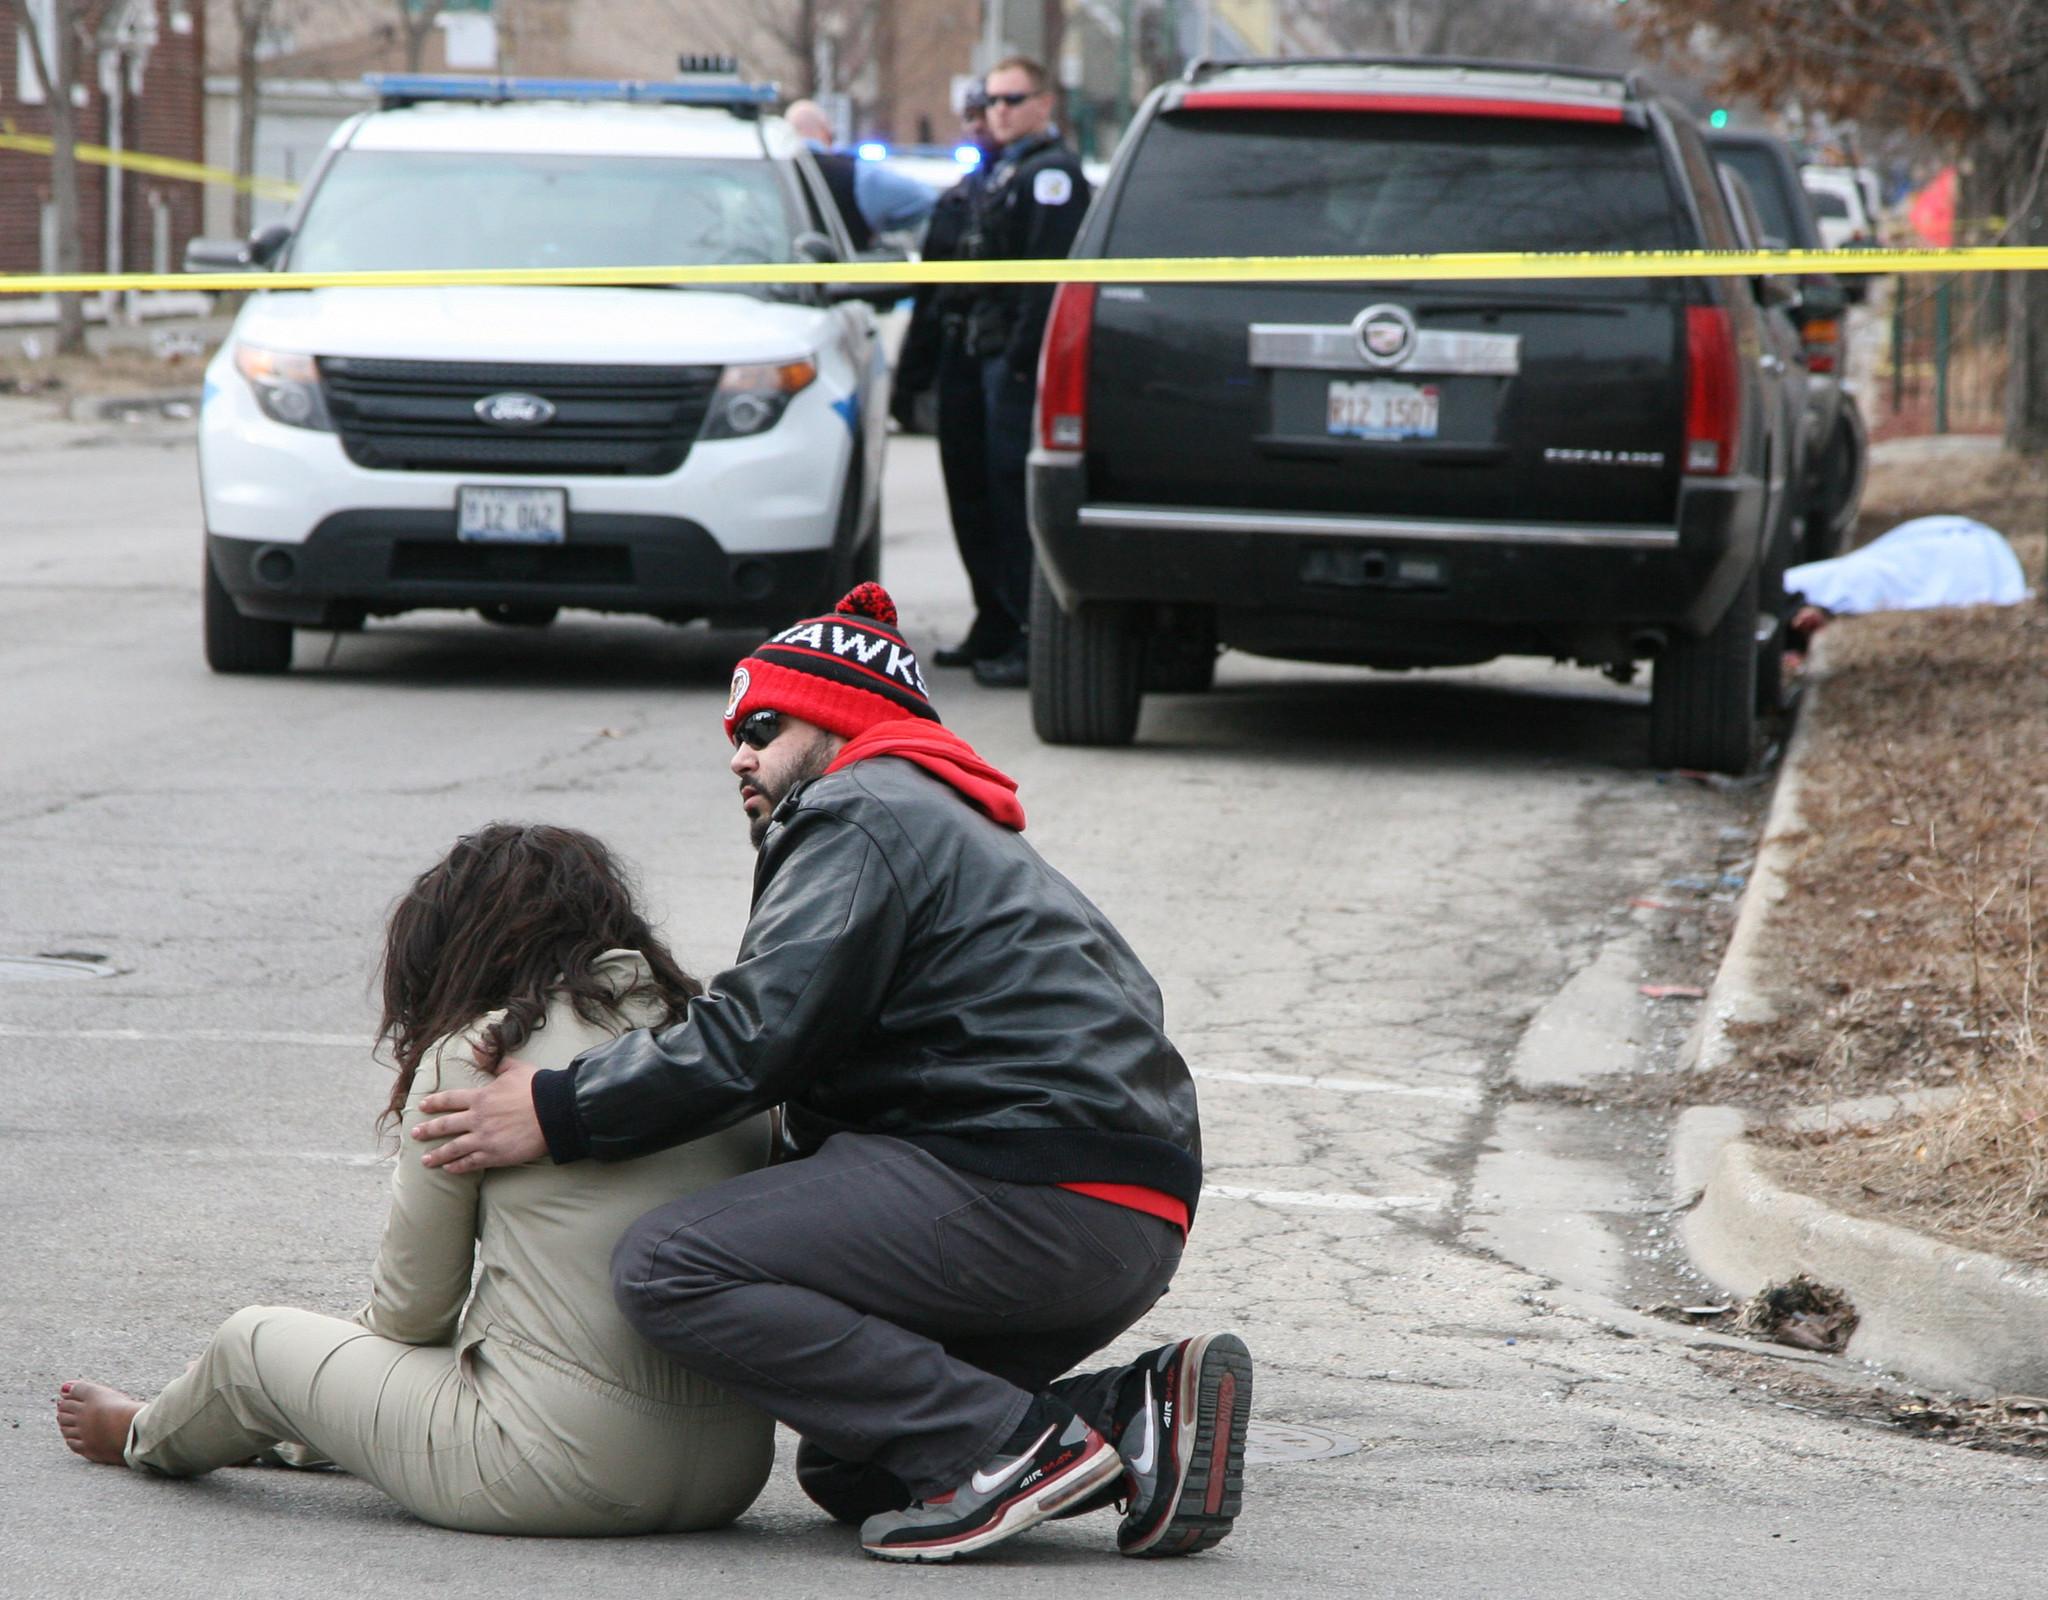 1 killed in Humboldt Park shooting - Chicago news - NewsLocker